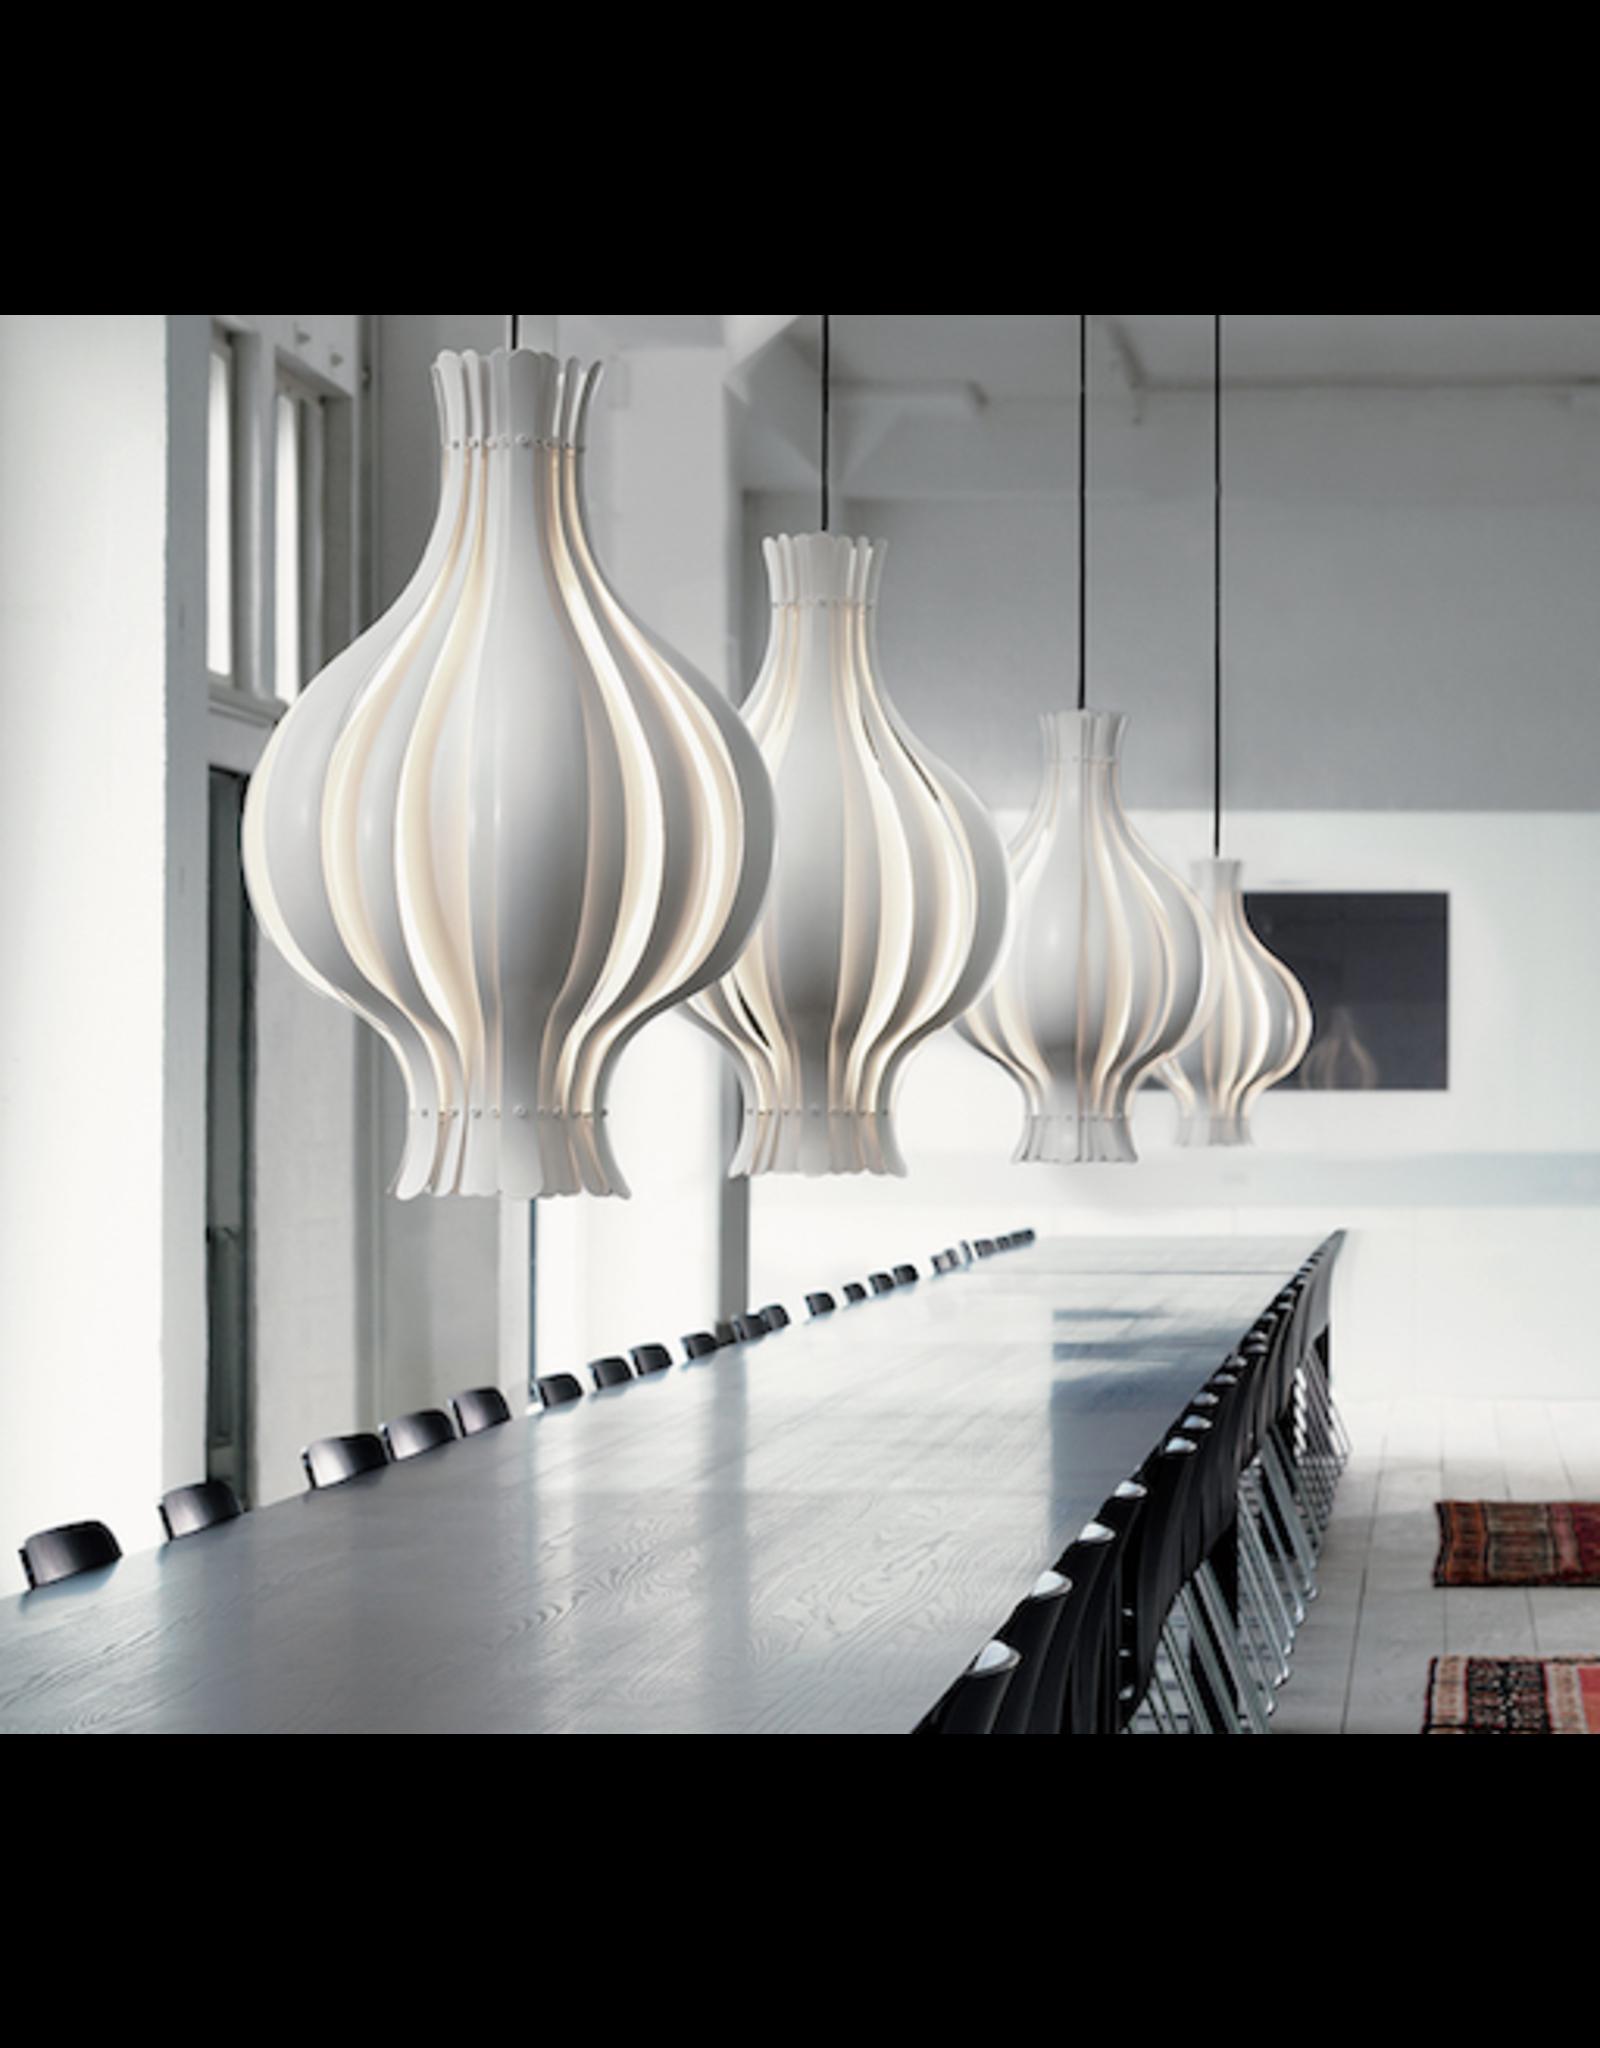 ONION-SHAPED PENDANT 白色面洋葱形金属吊灯